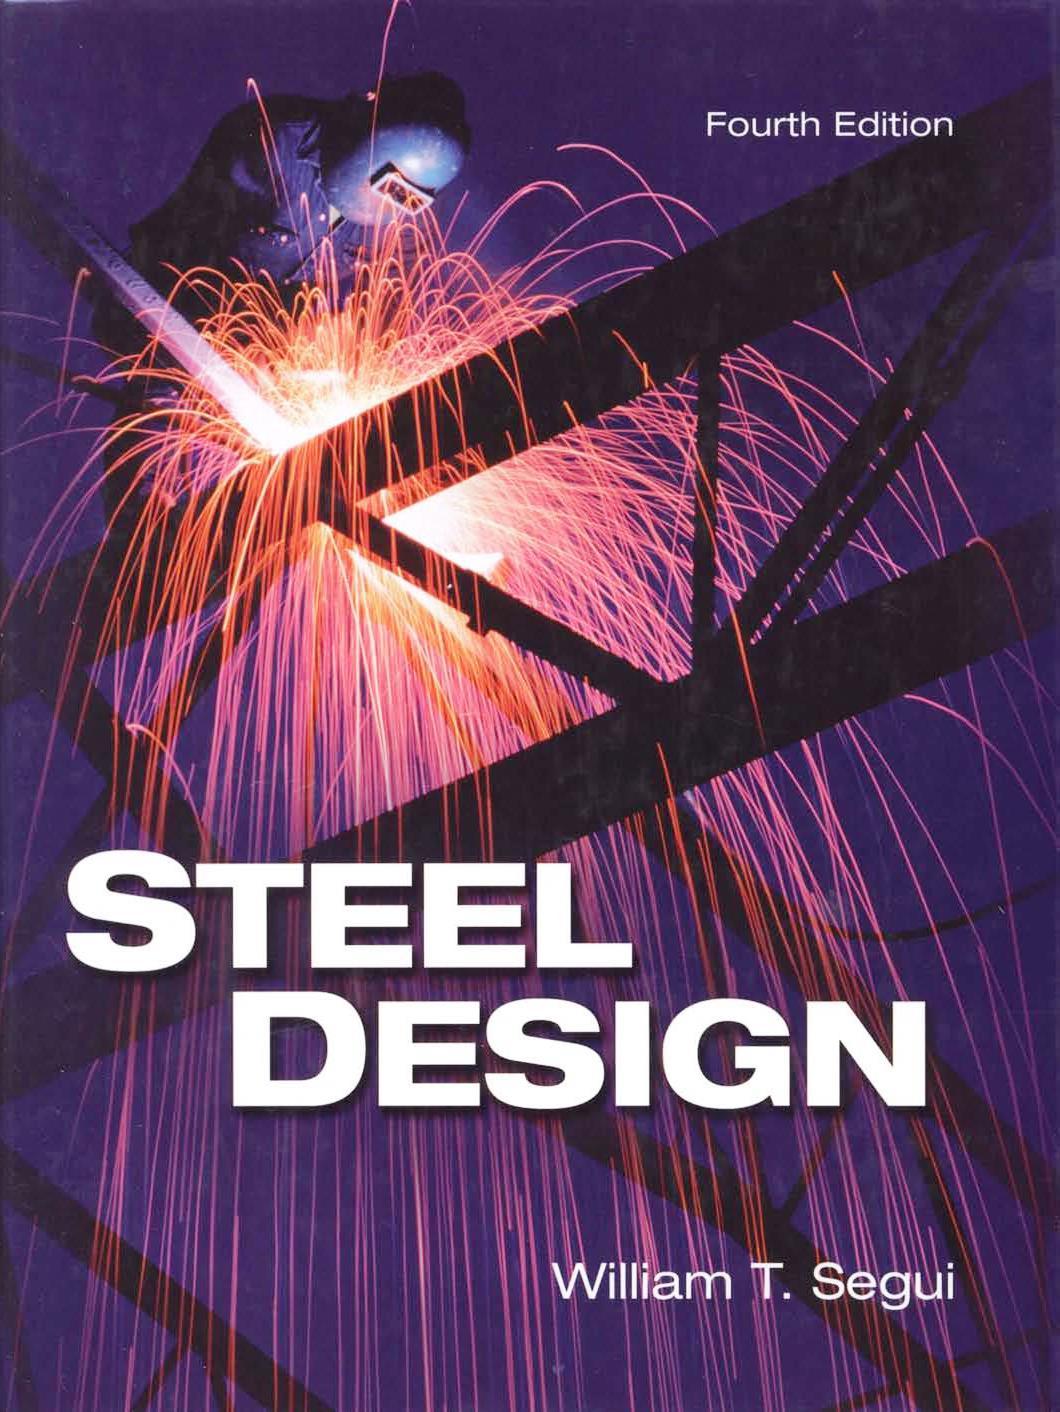 Steel Design, 4th Edition – William T. Segui